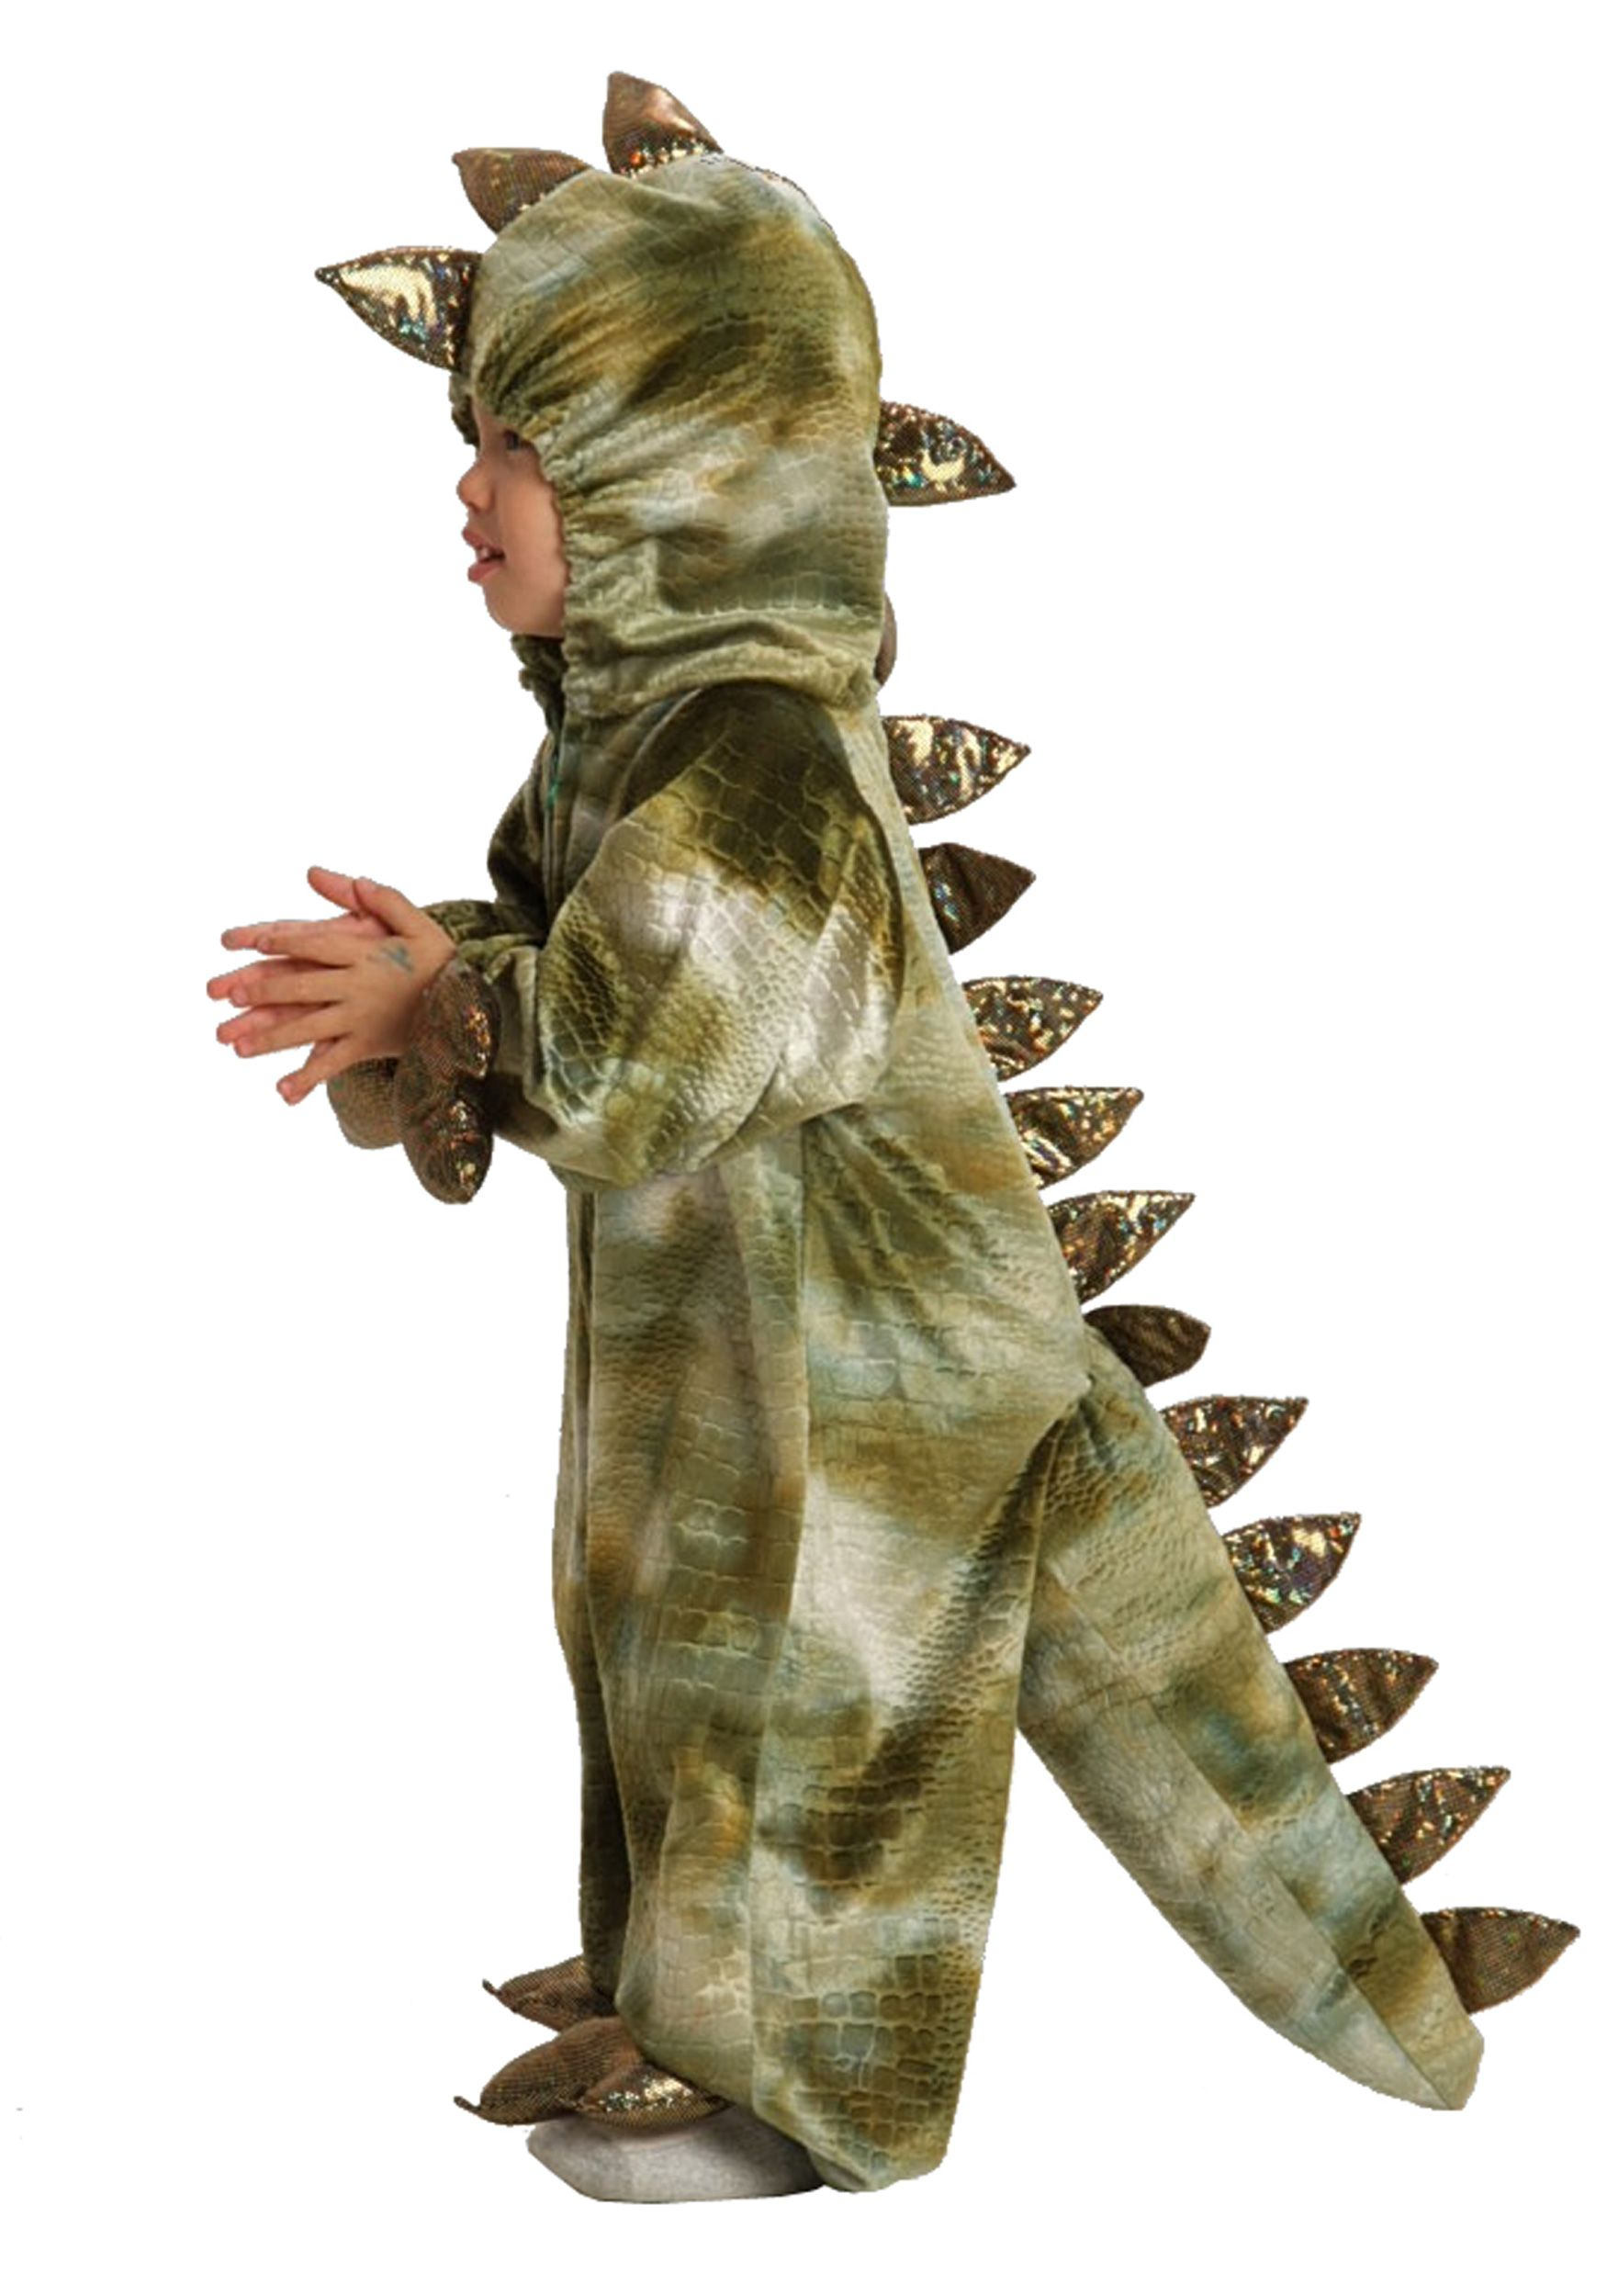 Kids Dinosaur Costume Kids Dinosaur Costume T Rex Halloween Costume Toddler Halloween Costumes